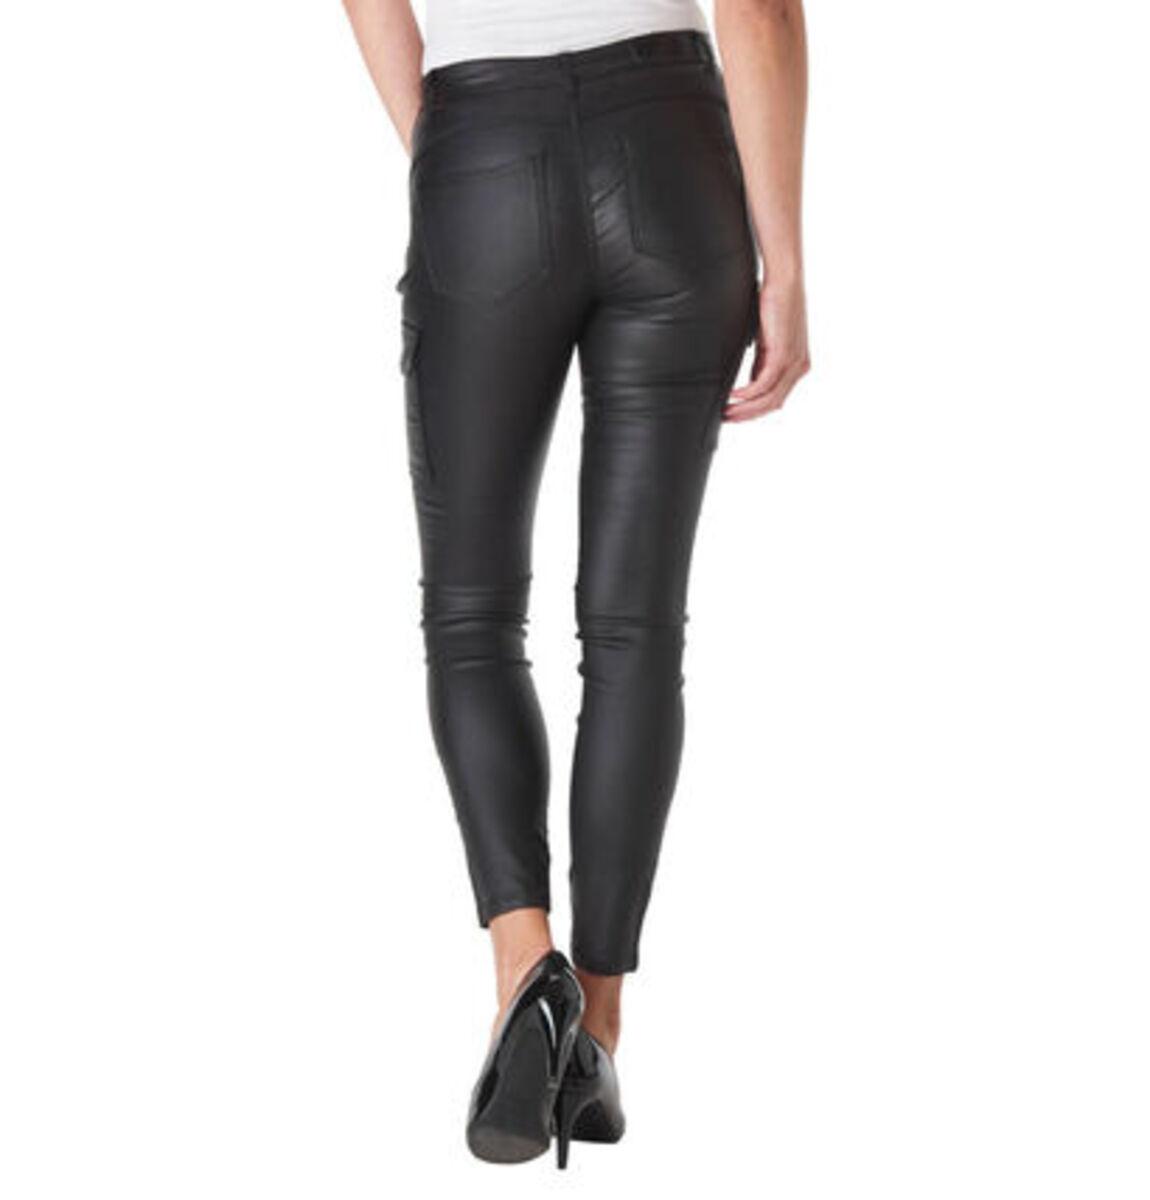 Bild 3 von Only Damen Hose in Leder-Optik